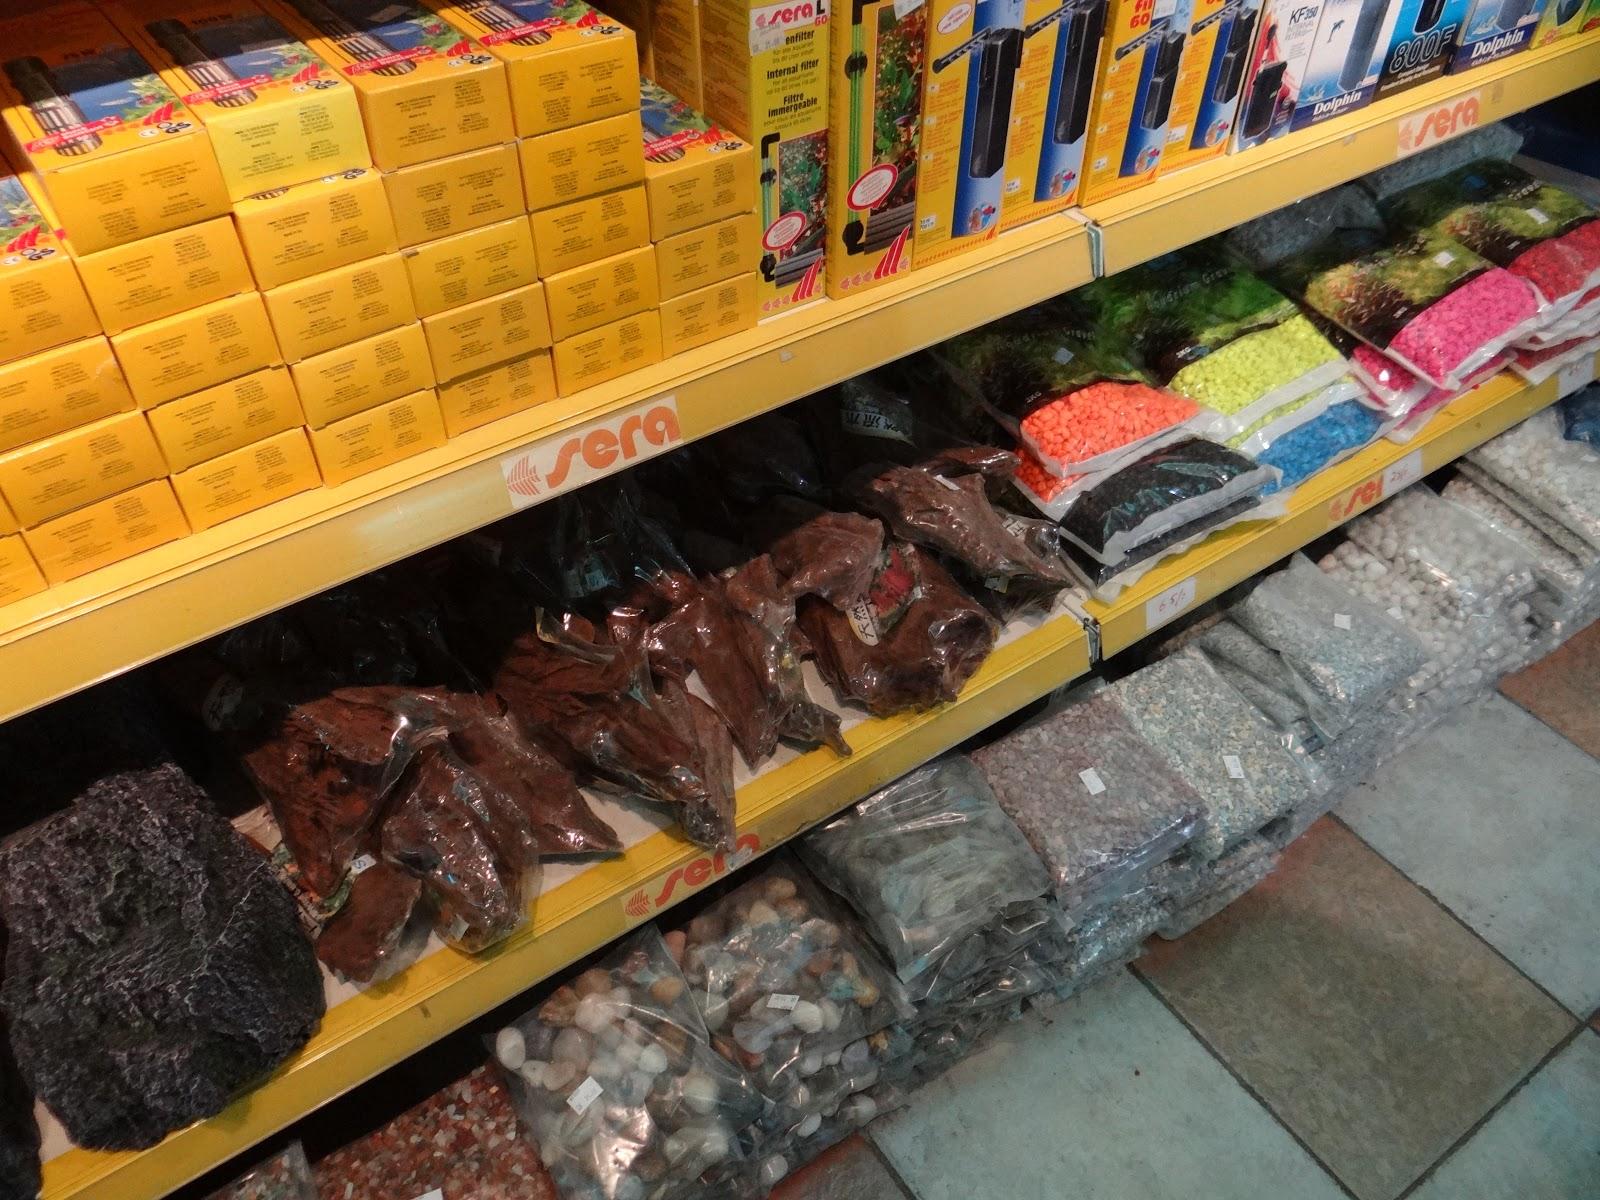 Fish aquarium sale in qatar - Gravel Of Many Colours Logs And Pumps